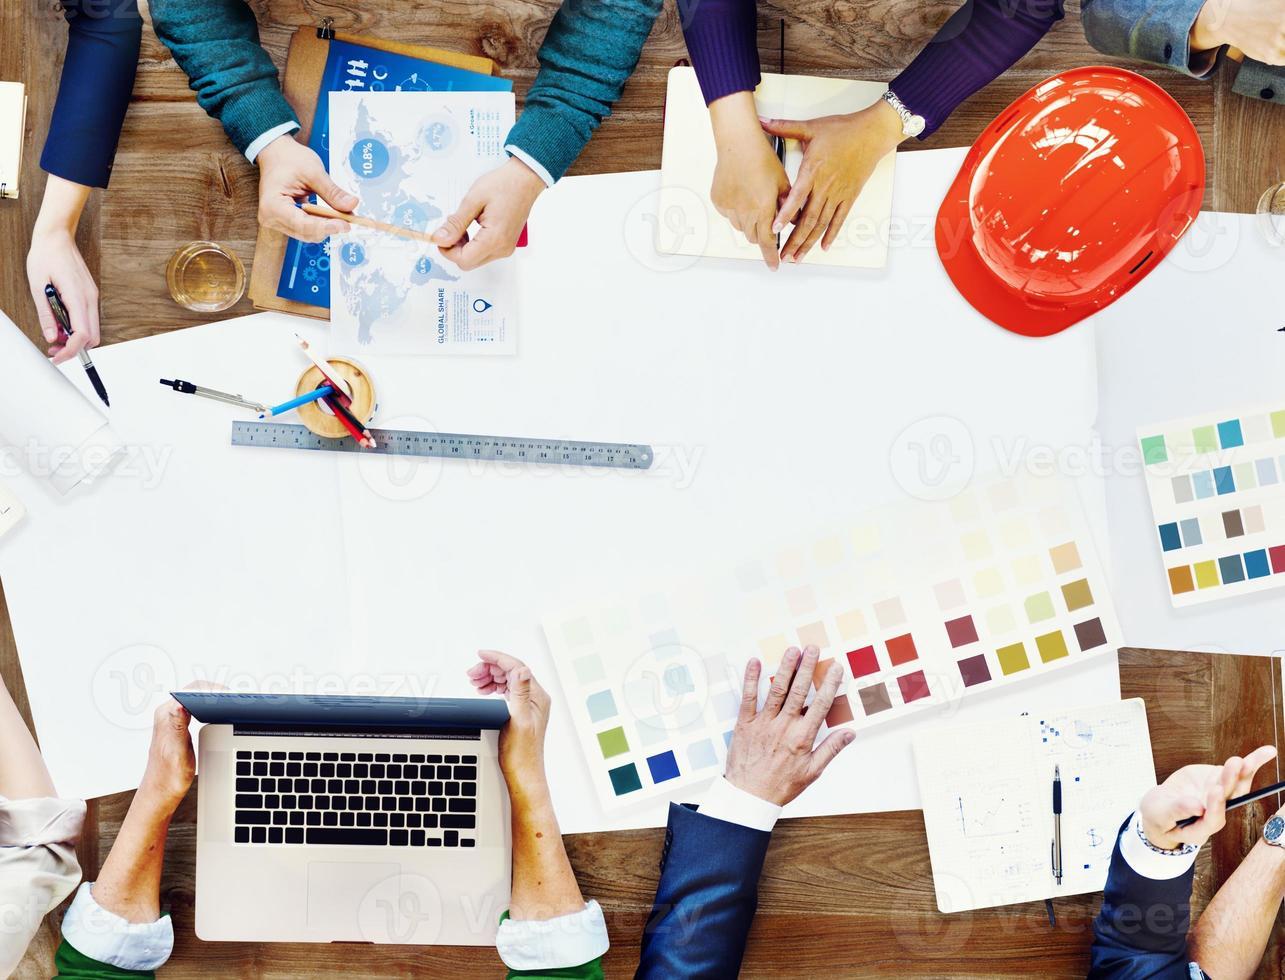 constraction design team möte brainstorming planeringskoncept foto